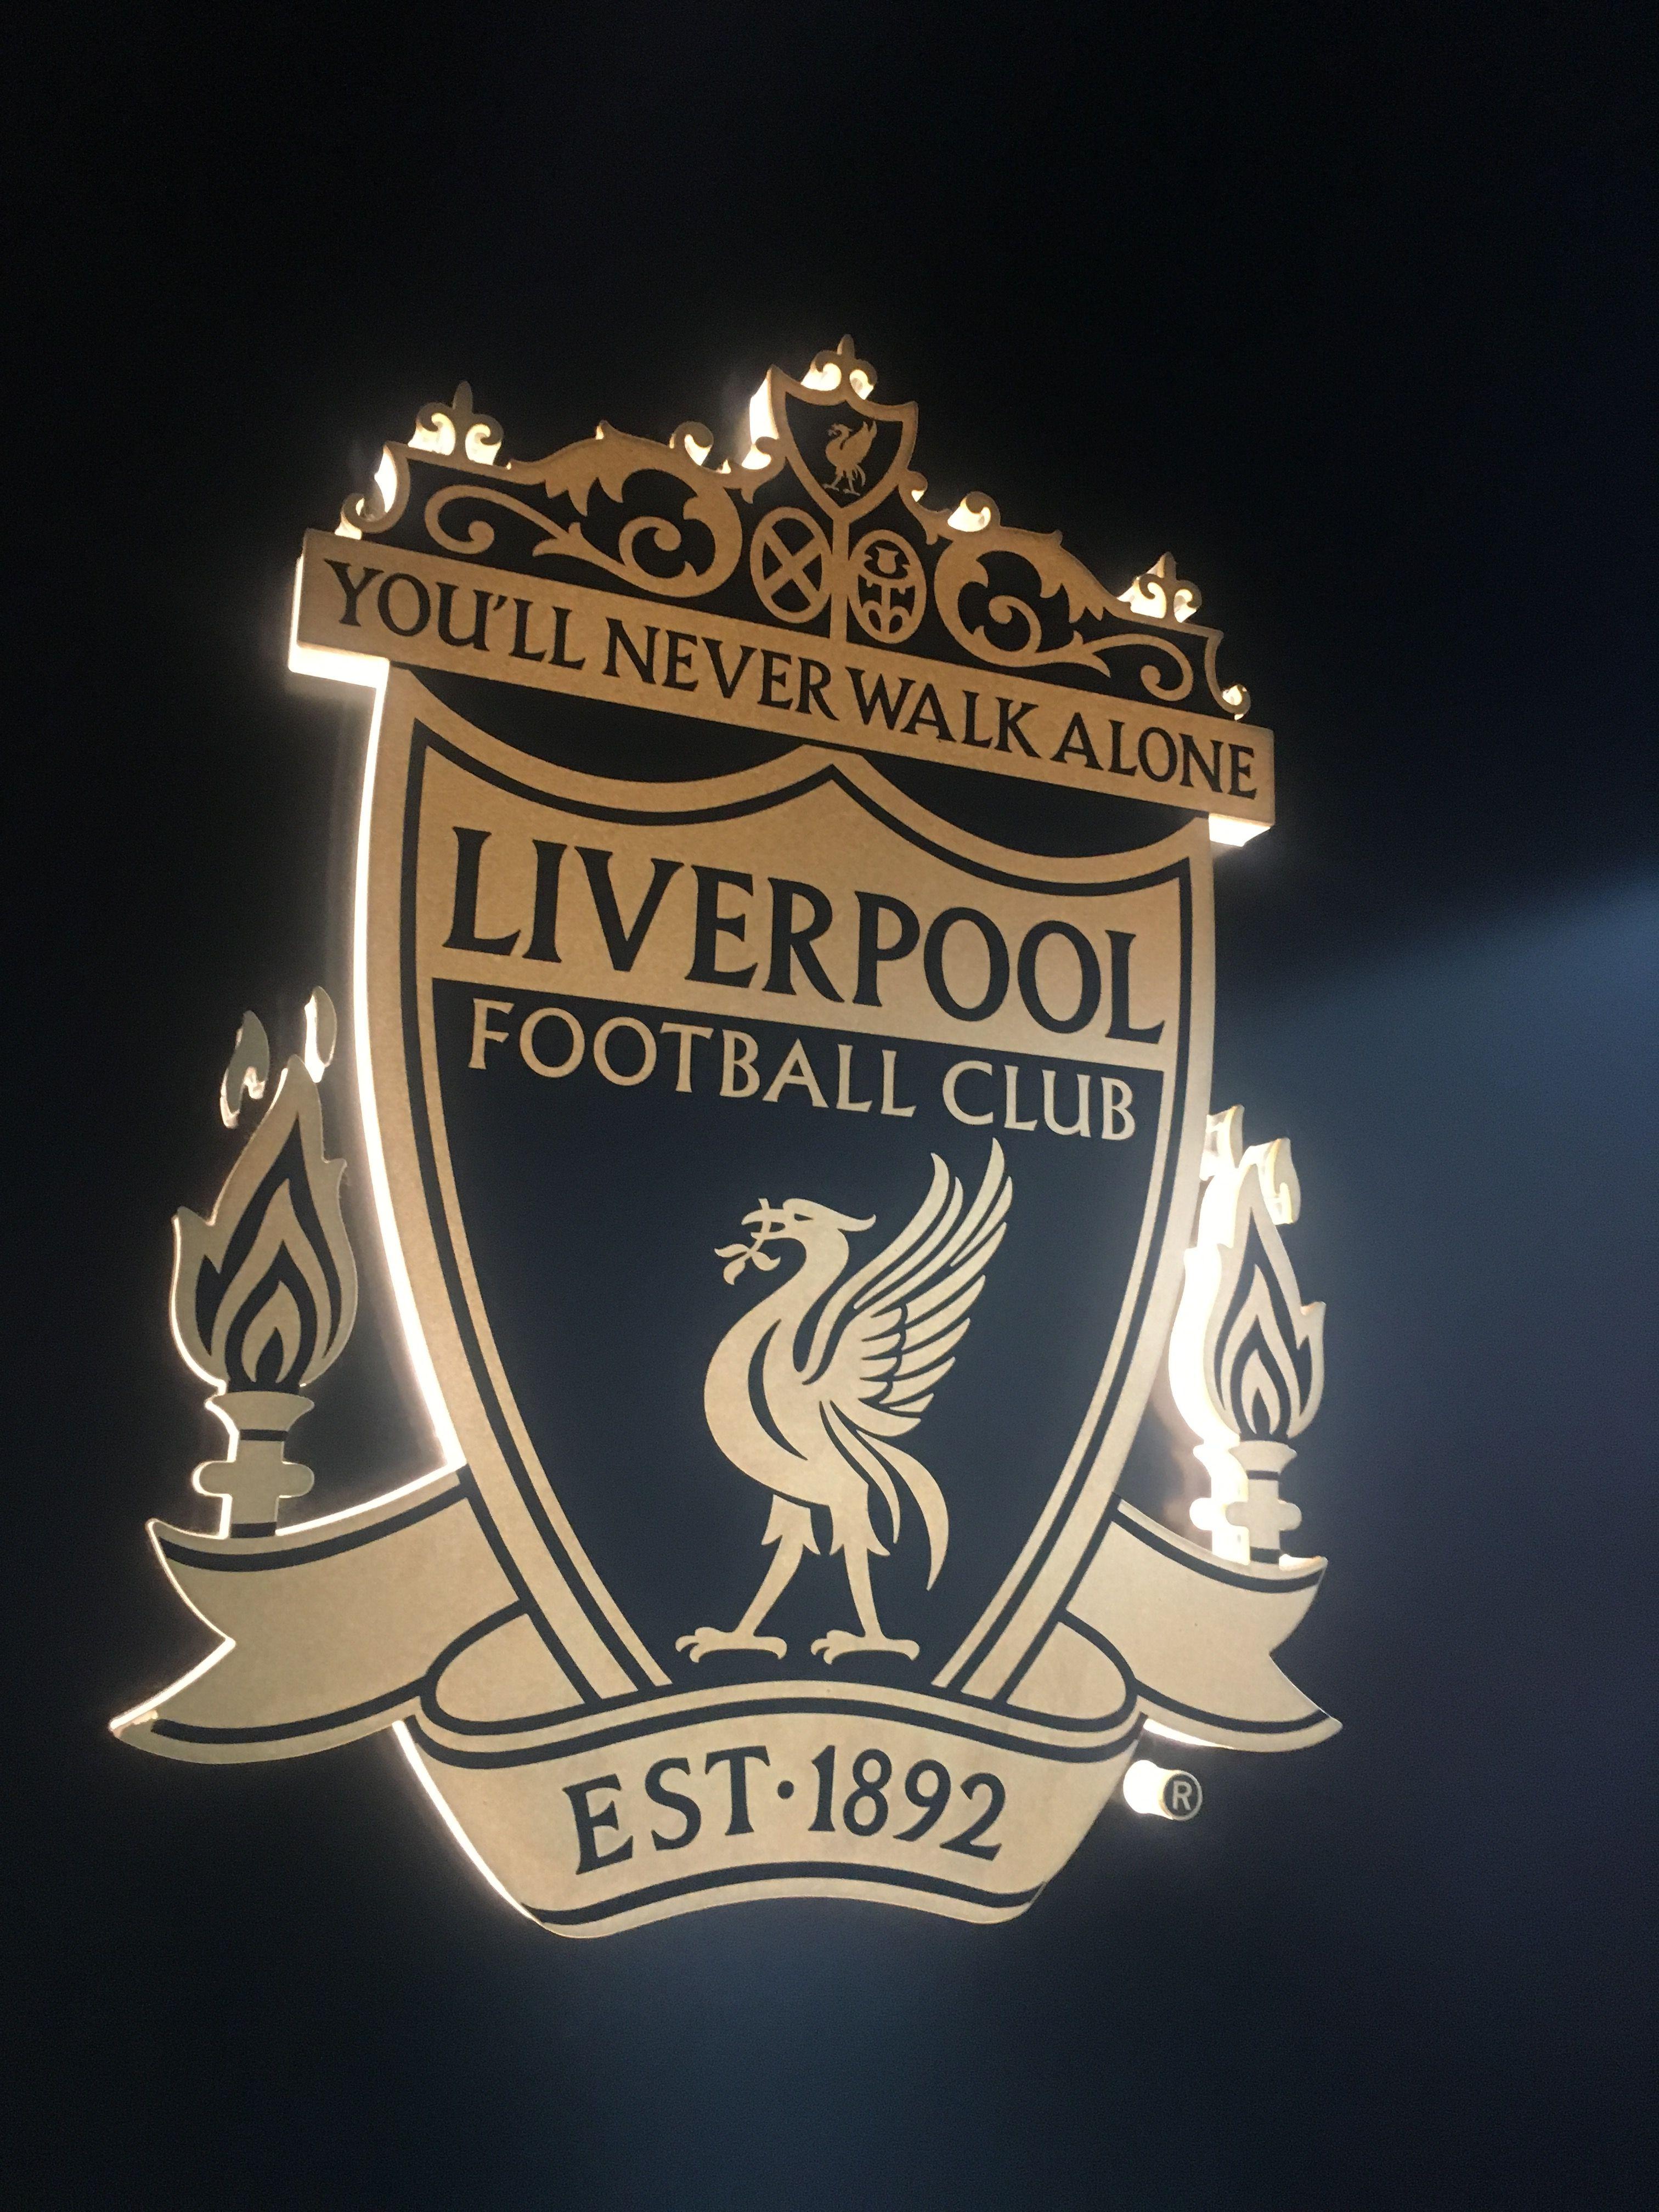 972ba03b015 Liverpool fc club badge https   play.google.com store